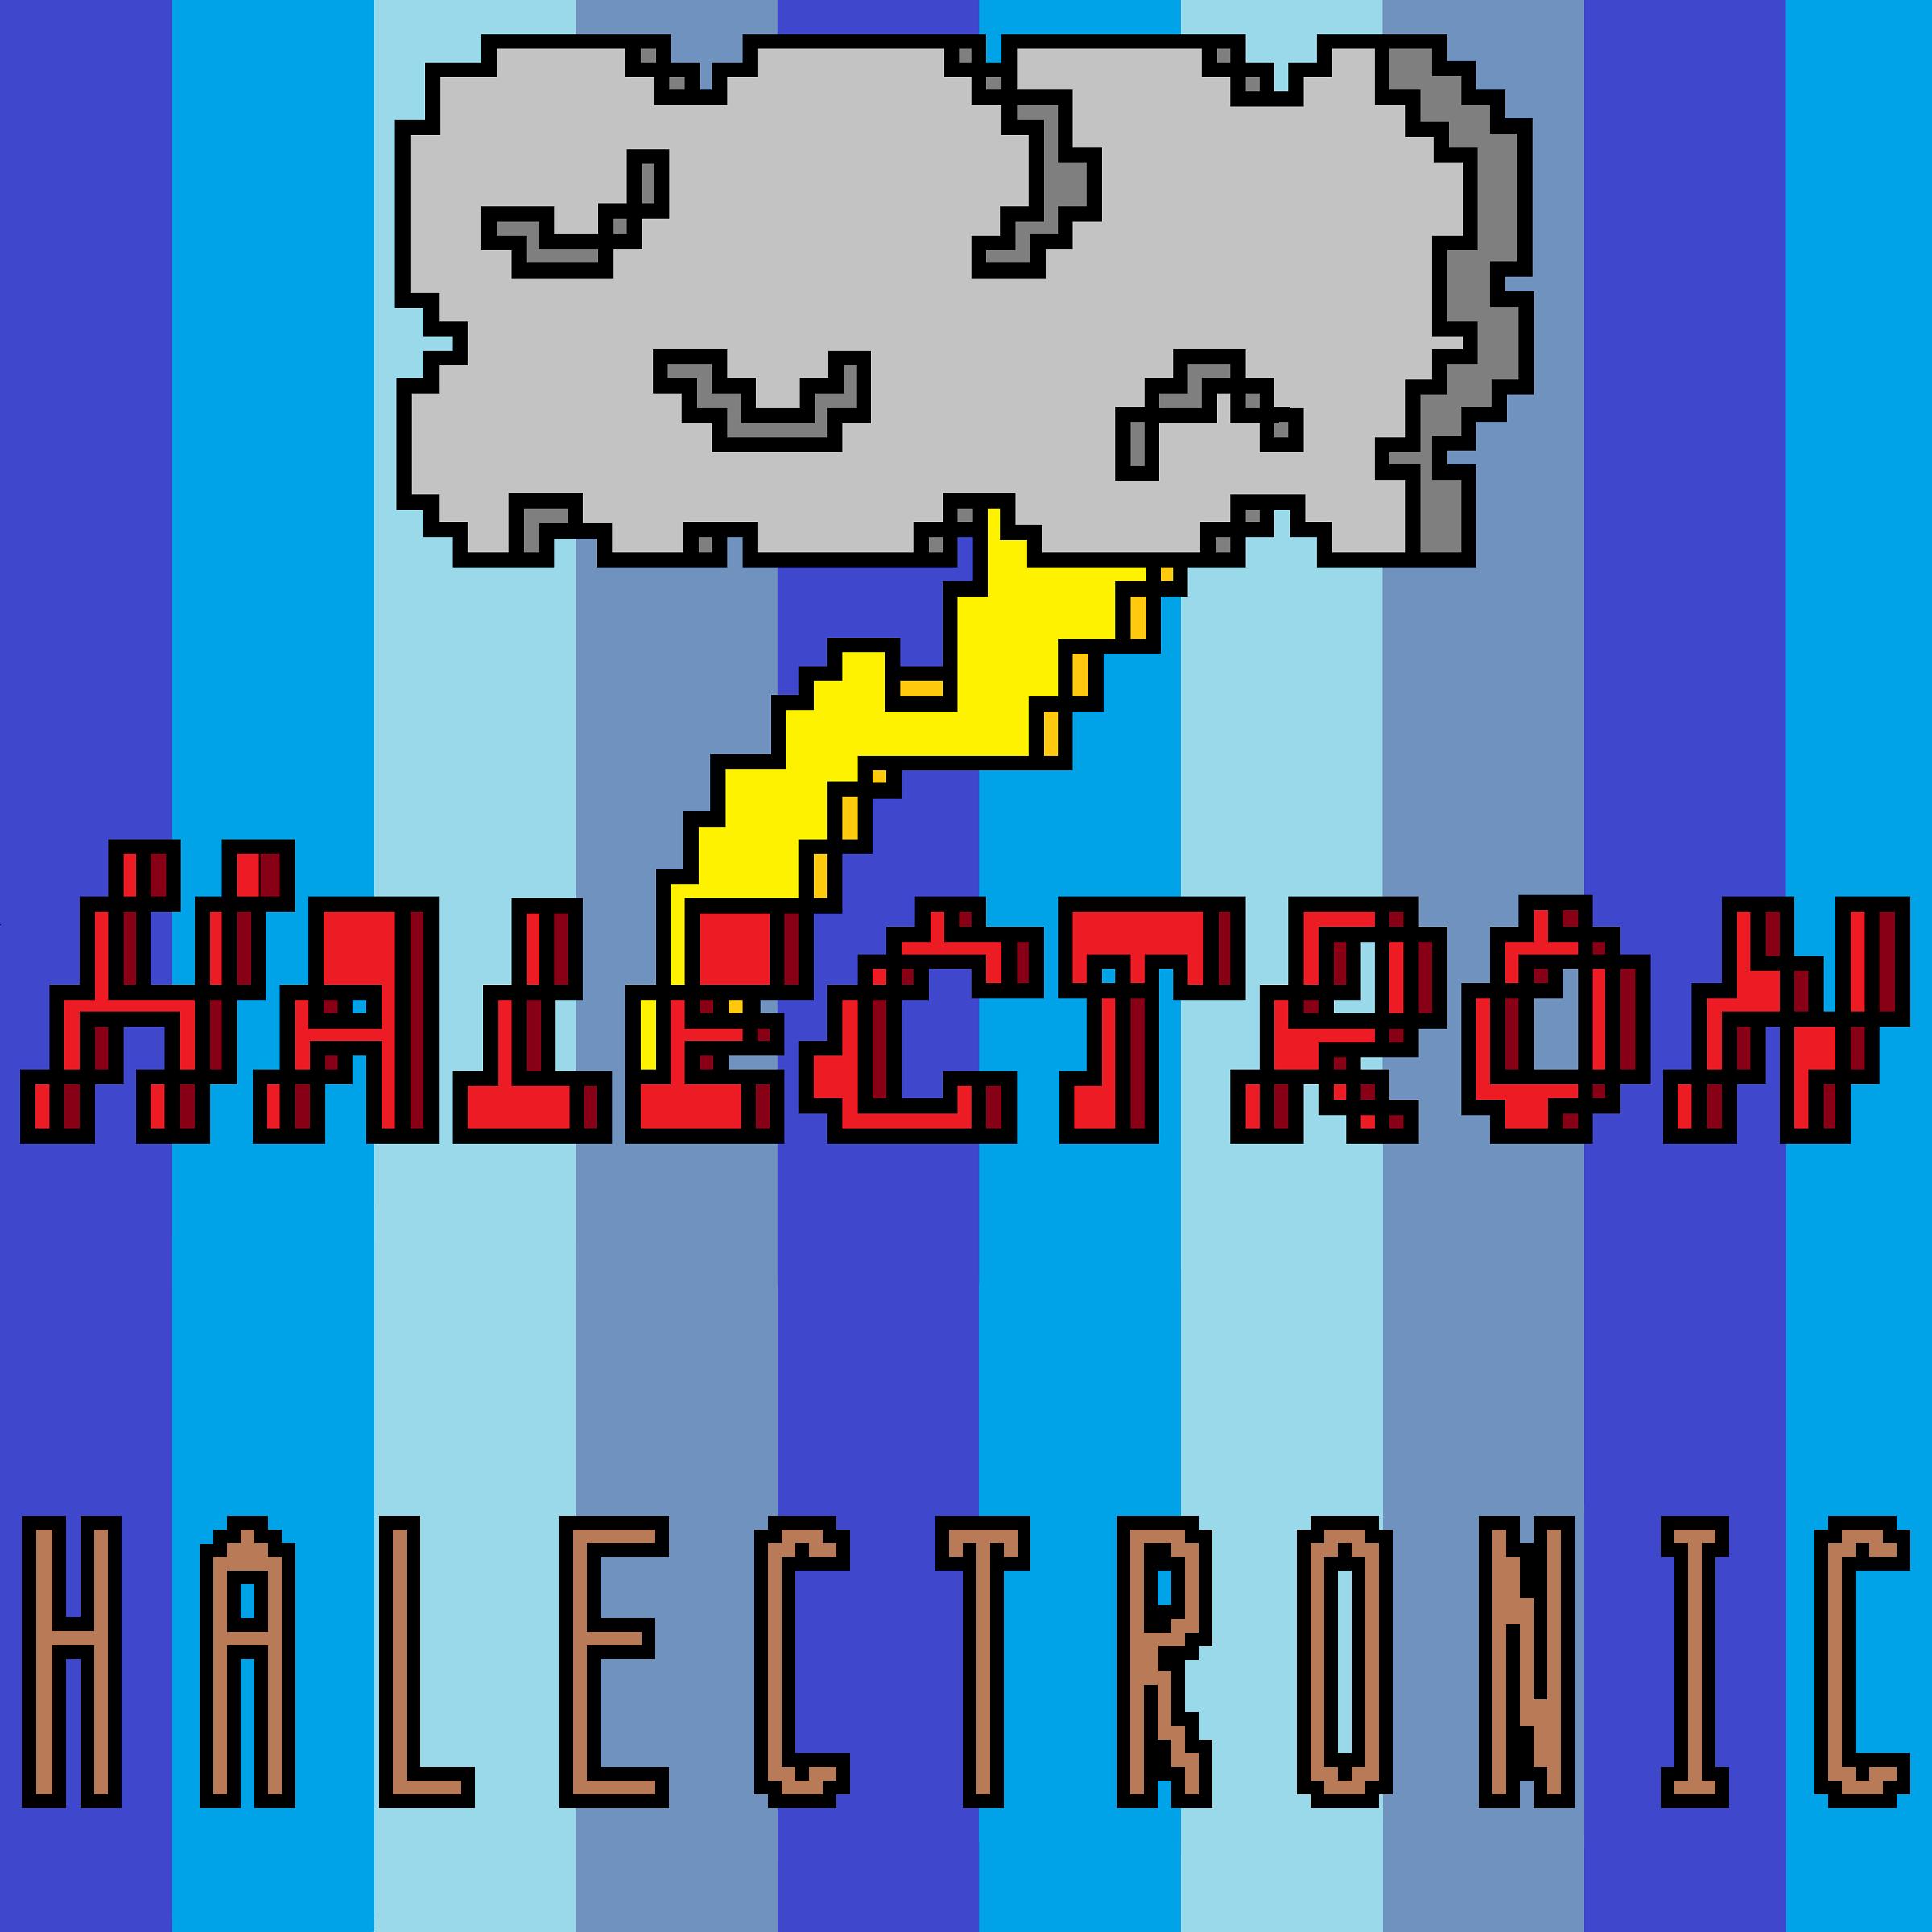 Halectron - Halectronic